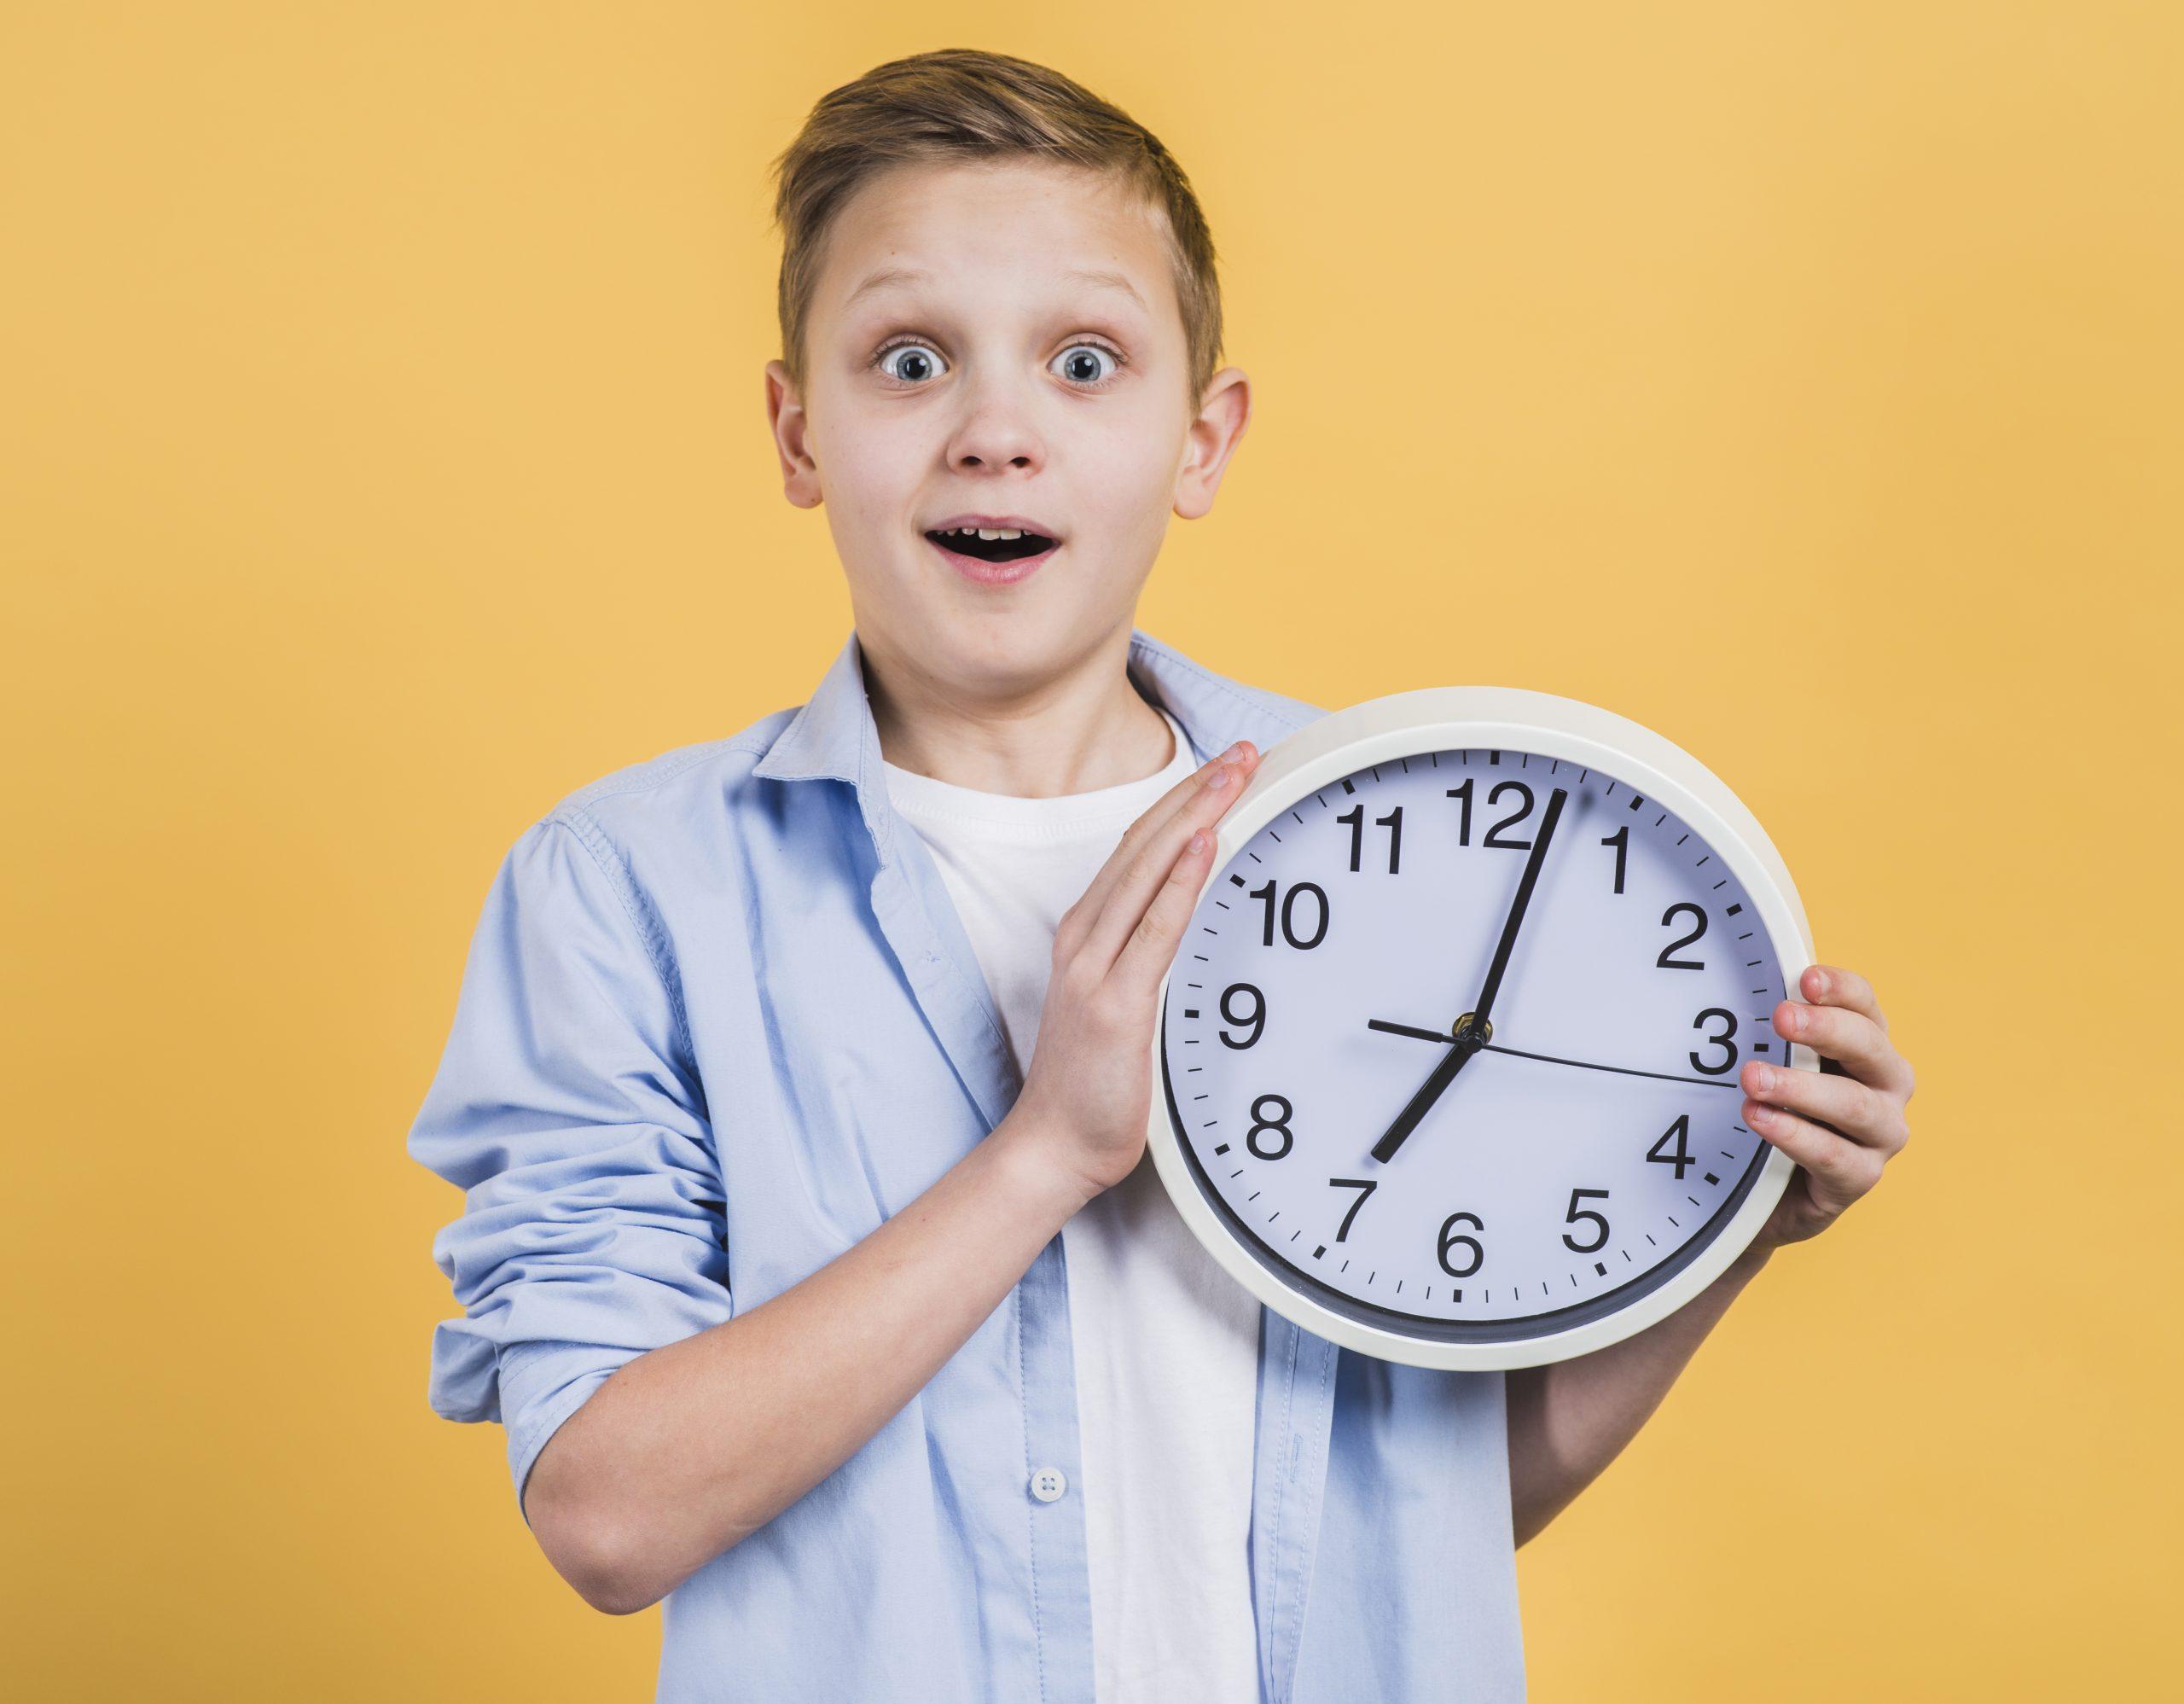 Consejos para volver a la escuela sobre la rutina matutina